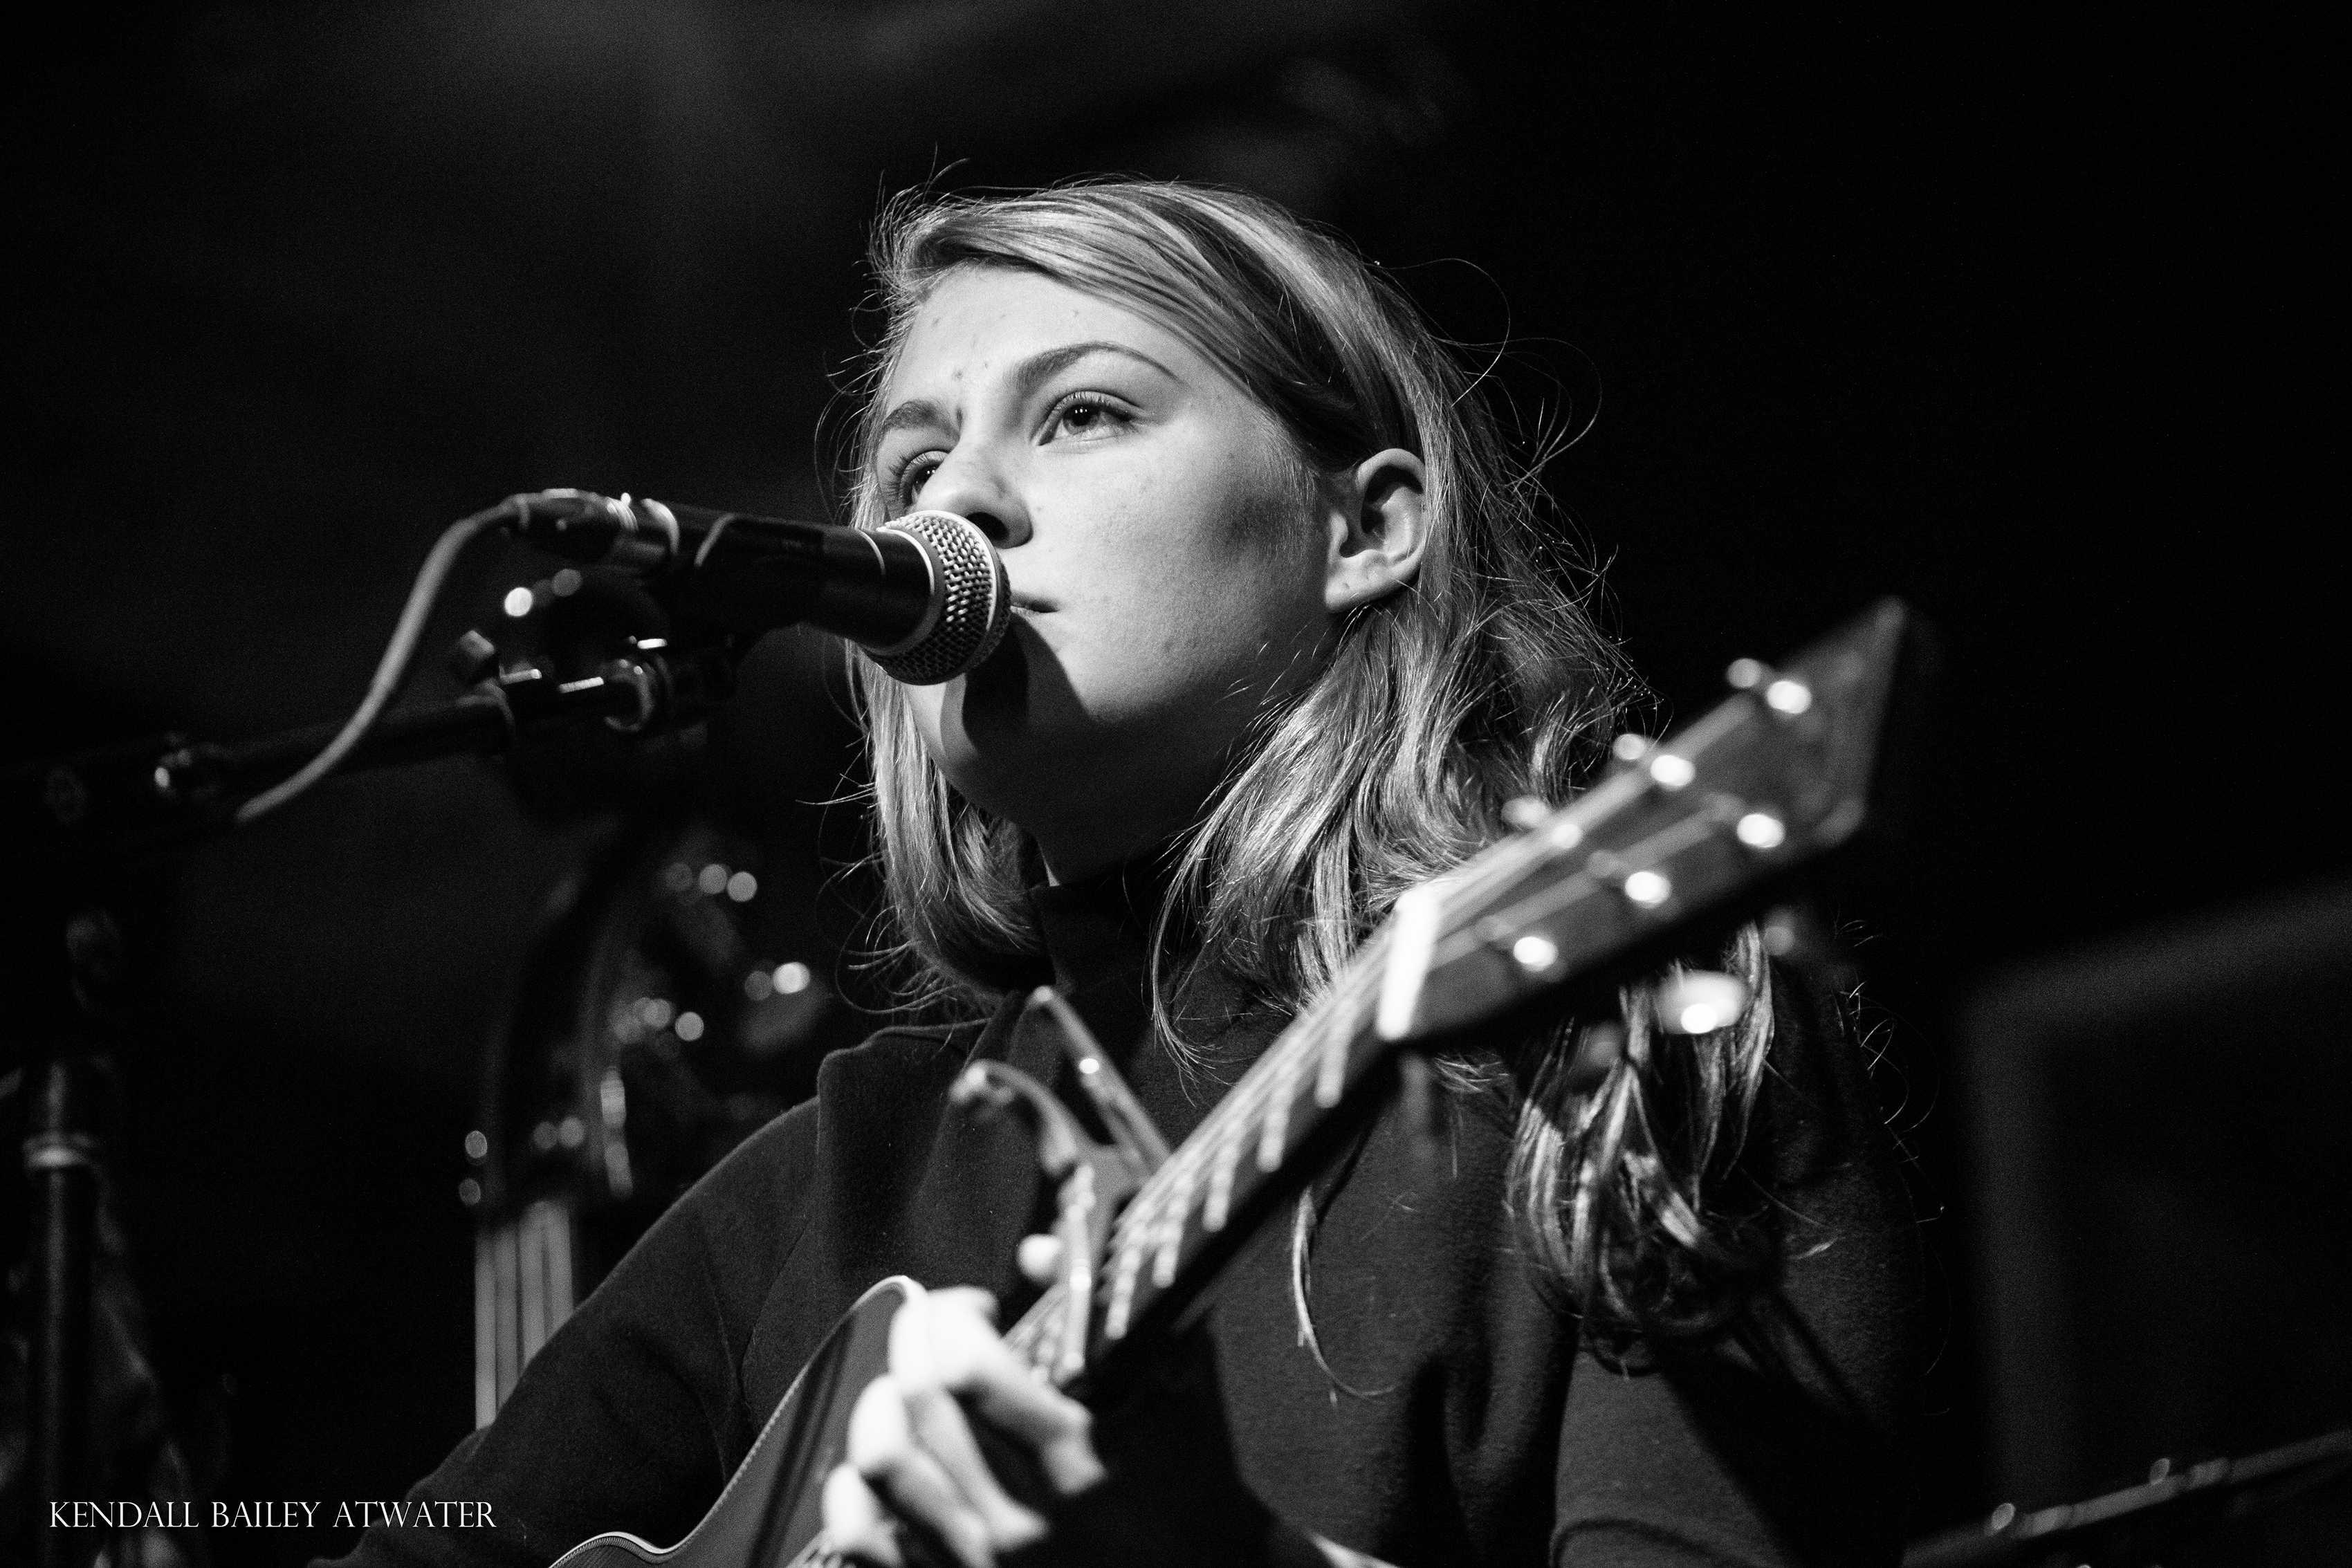 Kate Rhudy brings 'sad river folk' tunes to Boone